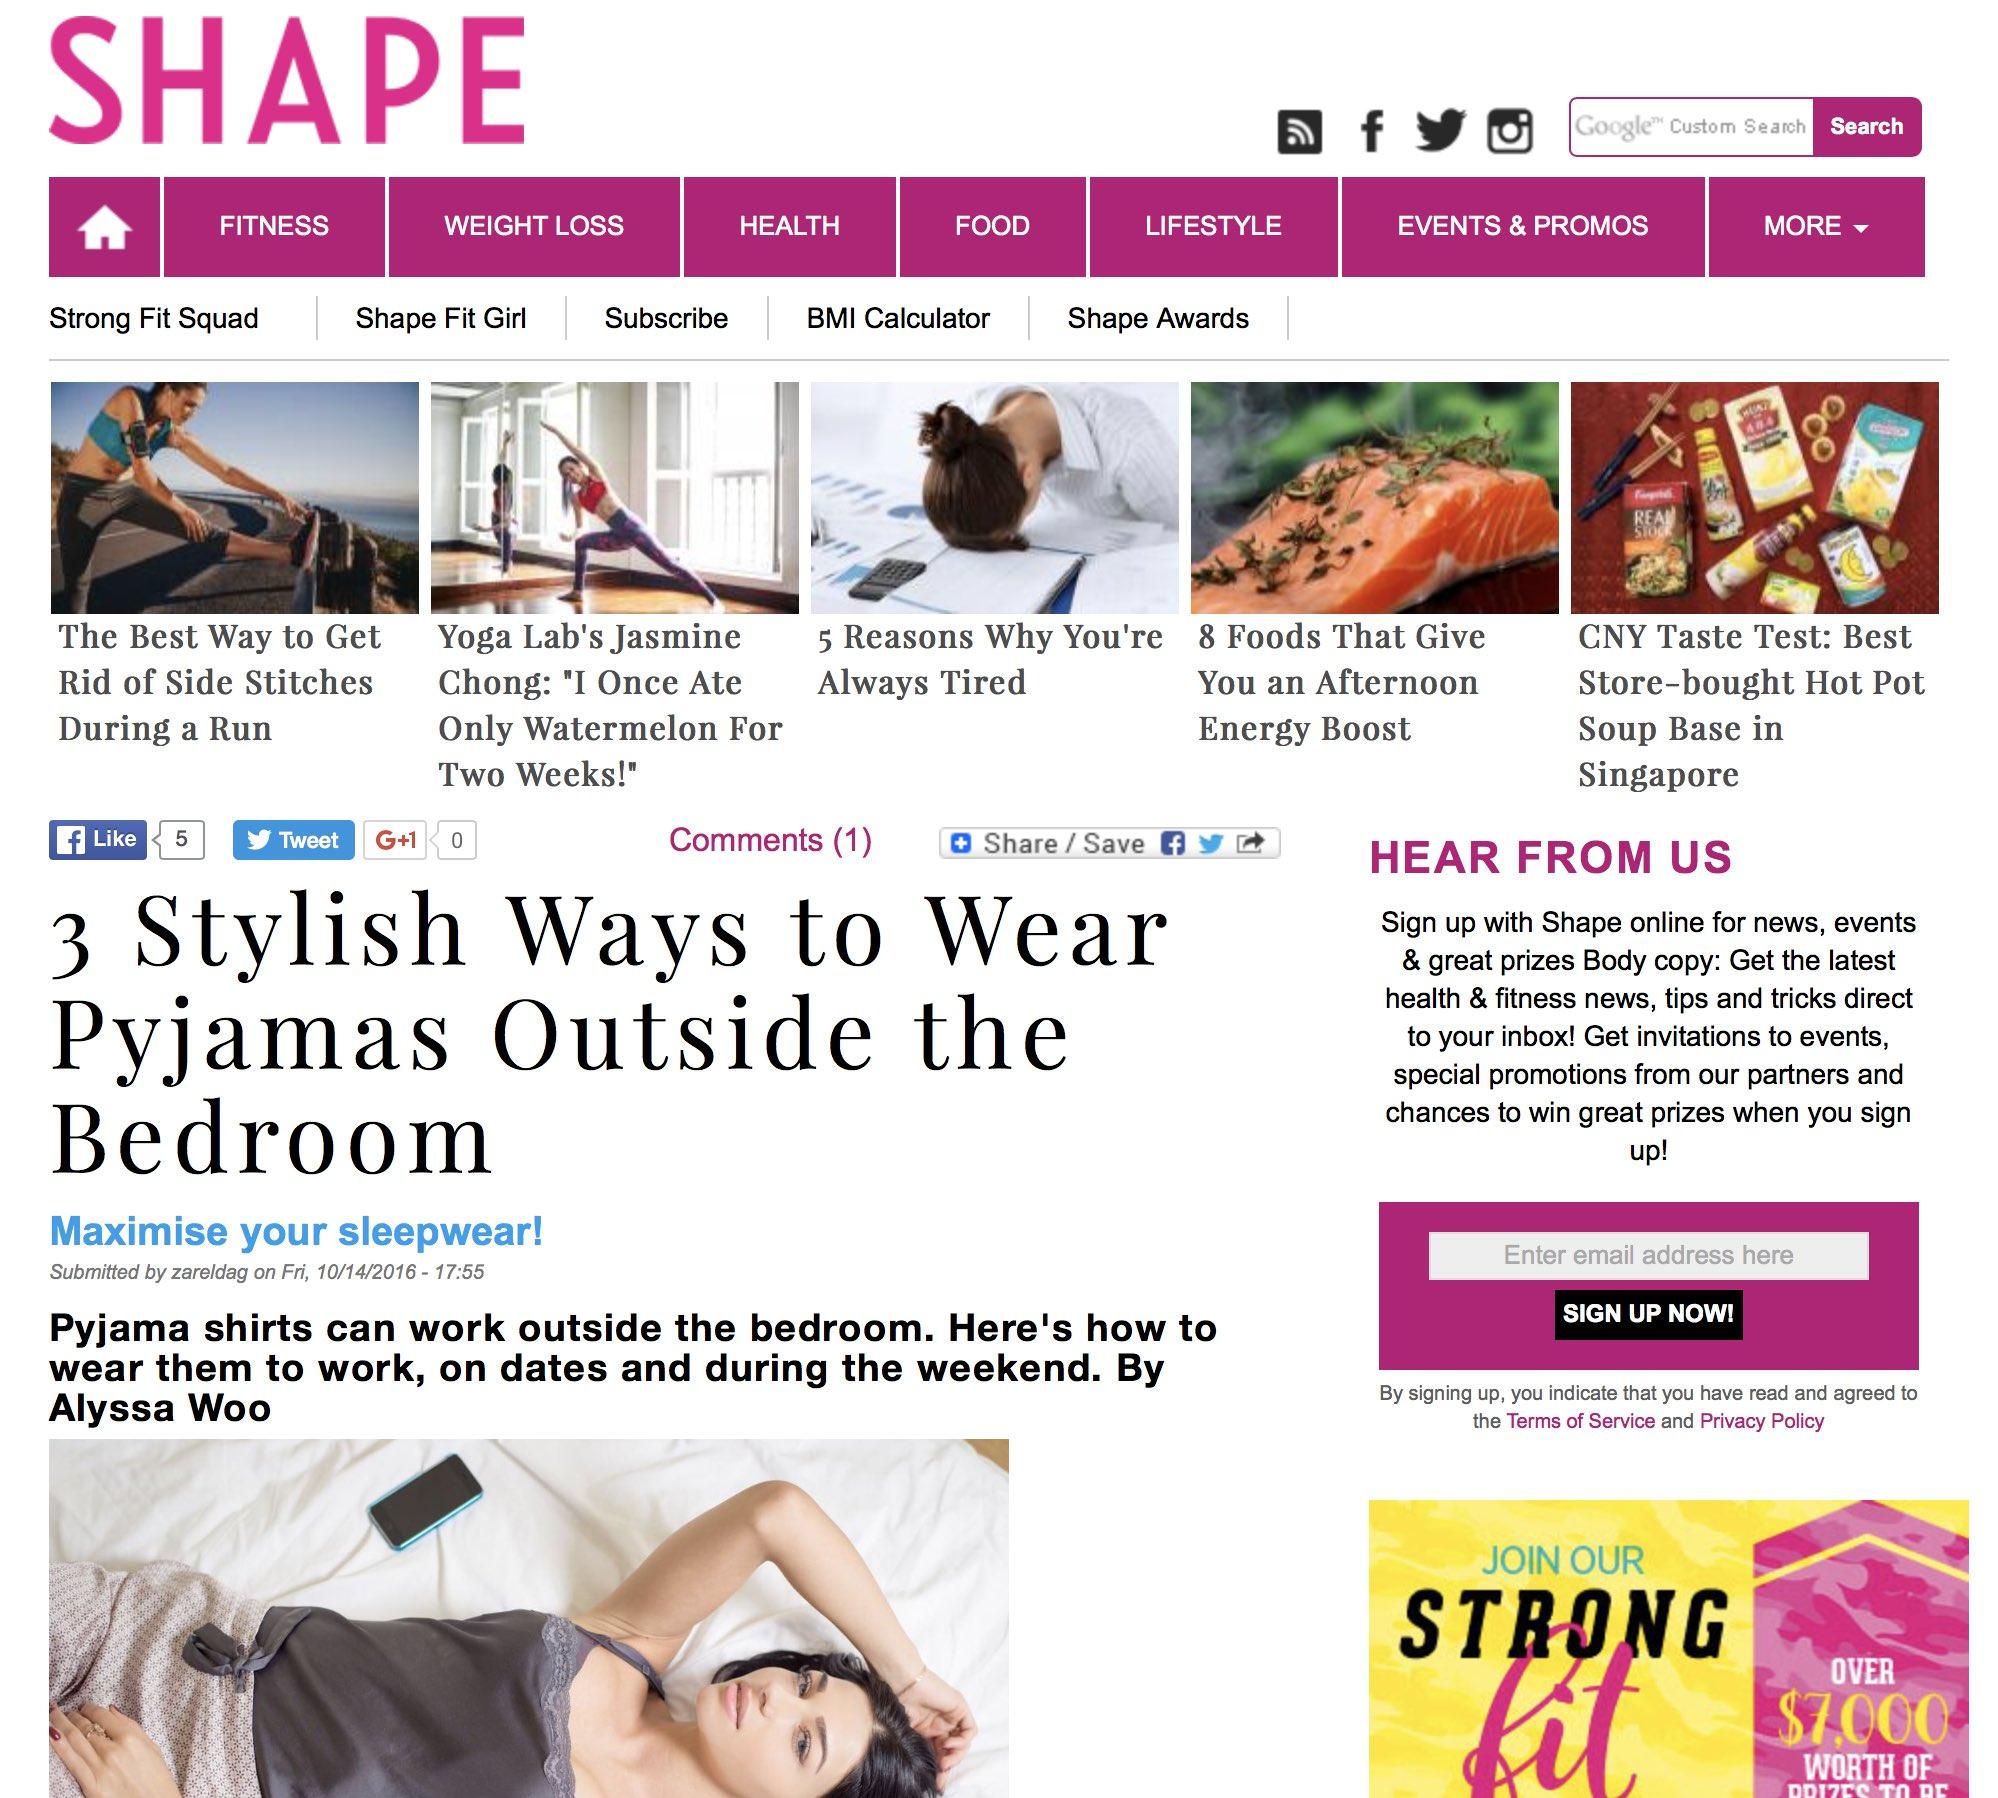 SHAPE - Page 1 copy.jpg